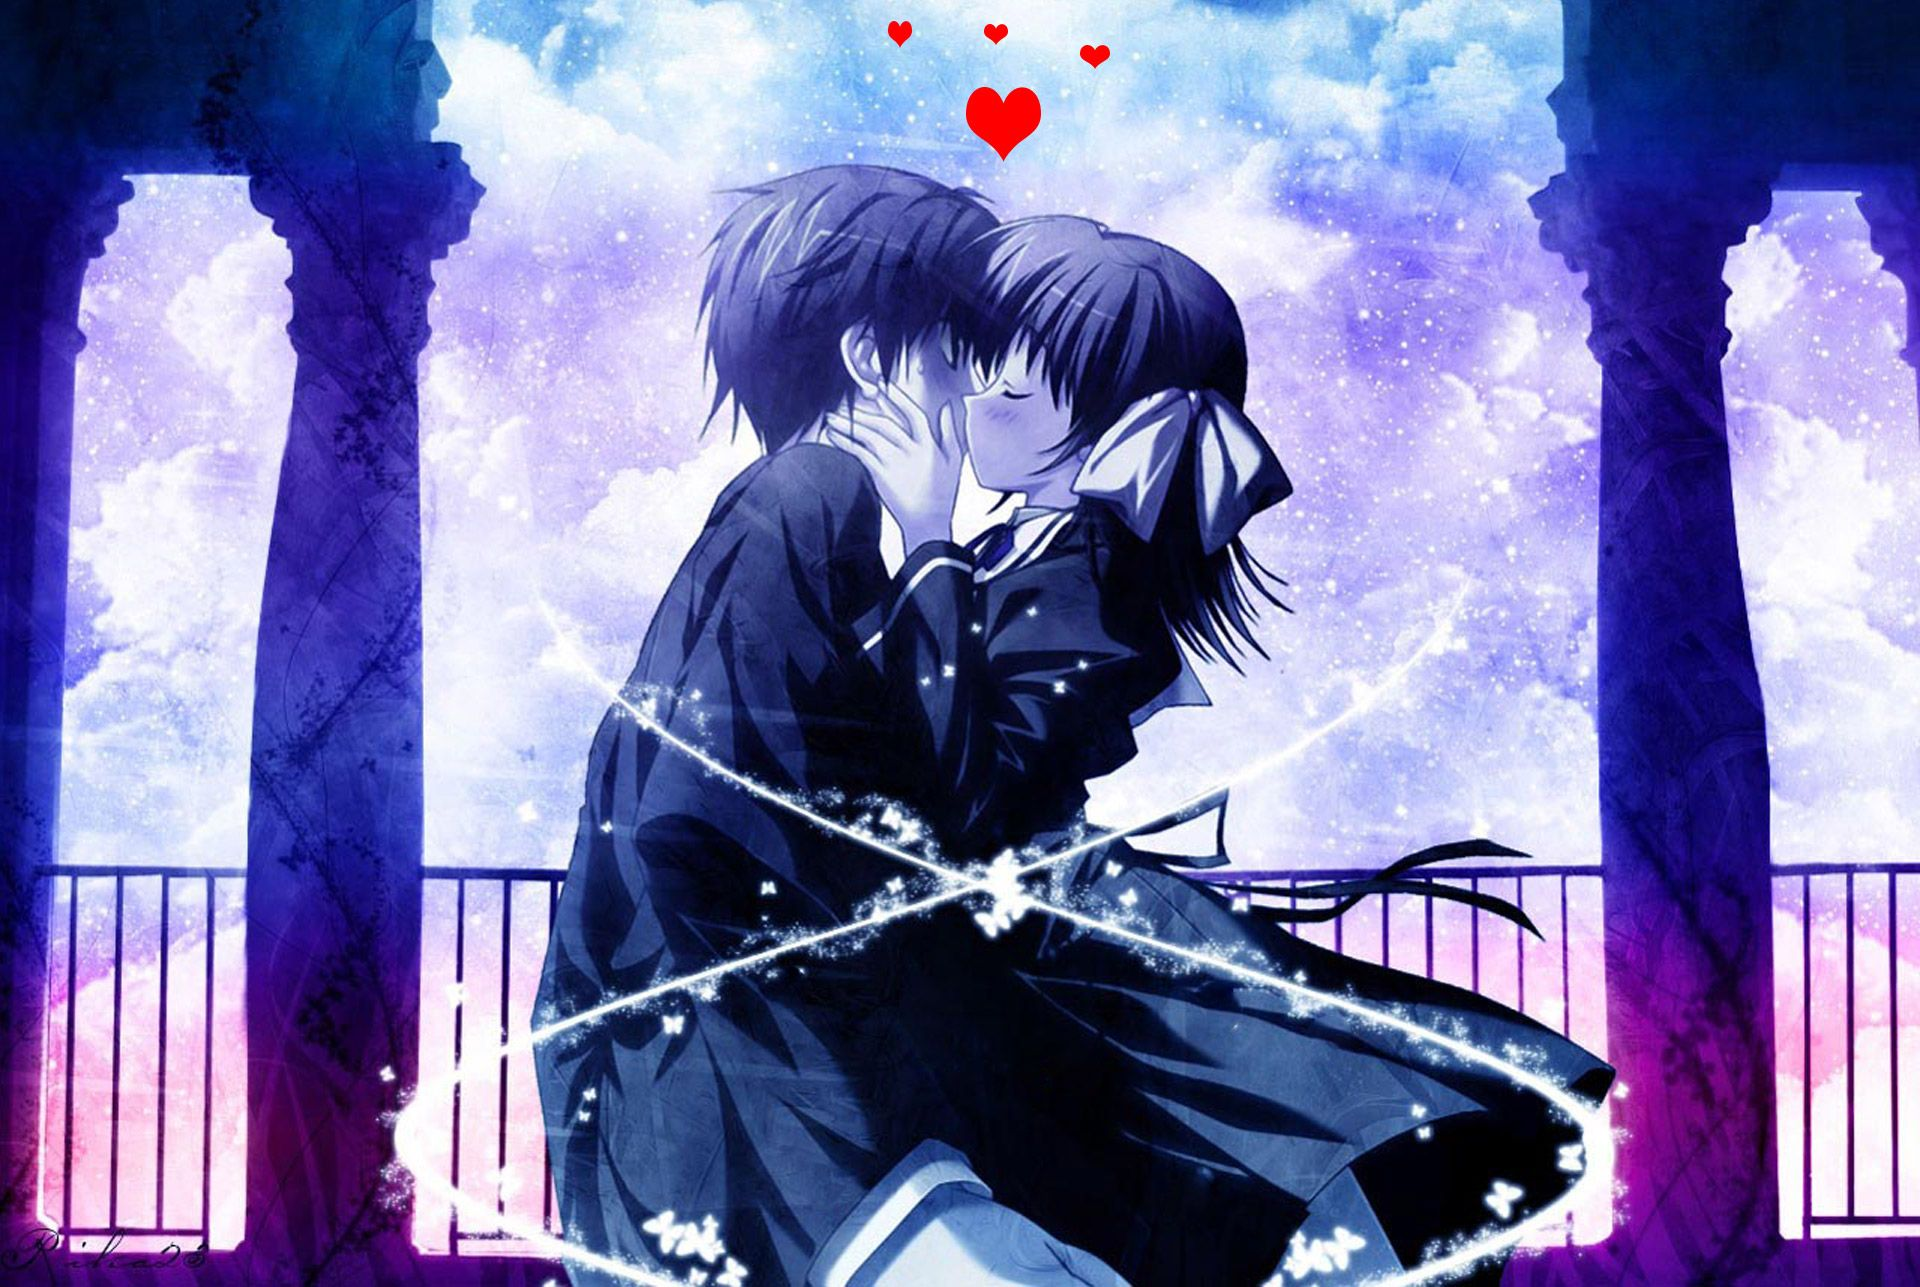 imagenes para fondo de escritorio fondo escritorio anime amor mi amore en 2019 anime